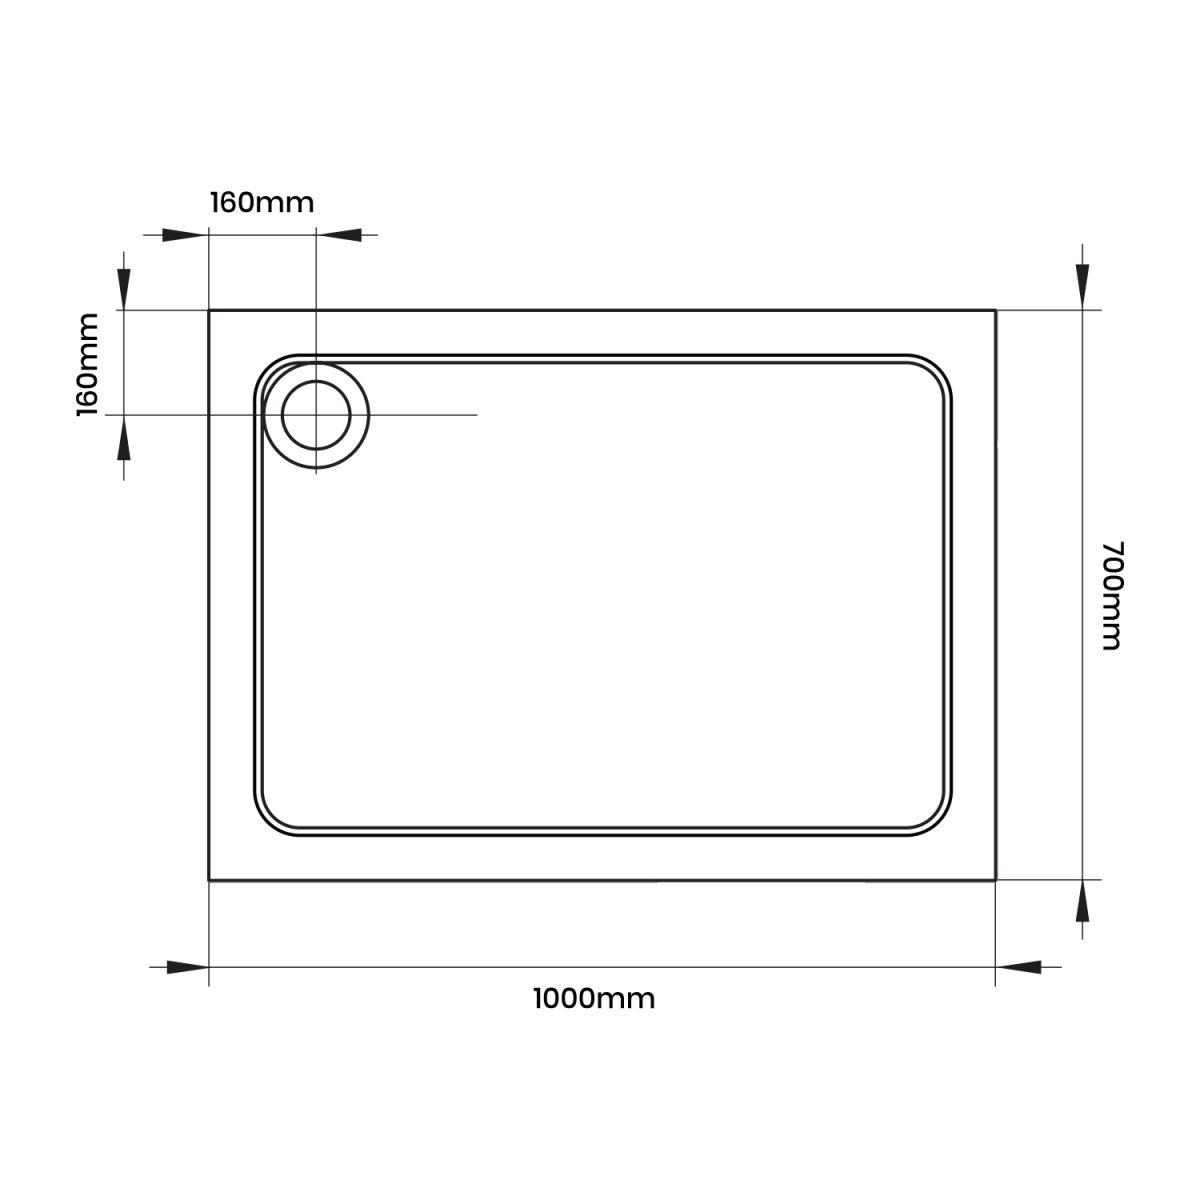 Aquadart Rectangular 1000 x 700 Shower Tray Dimensions